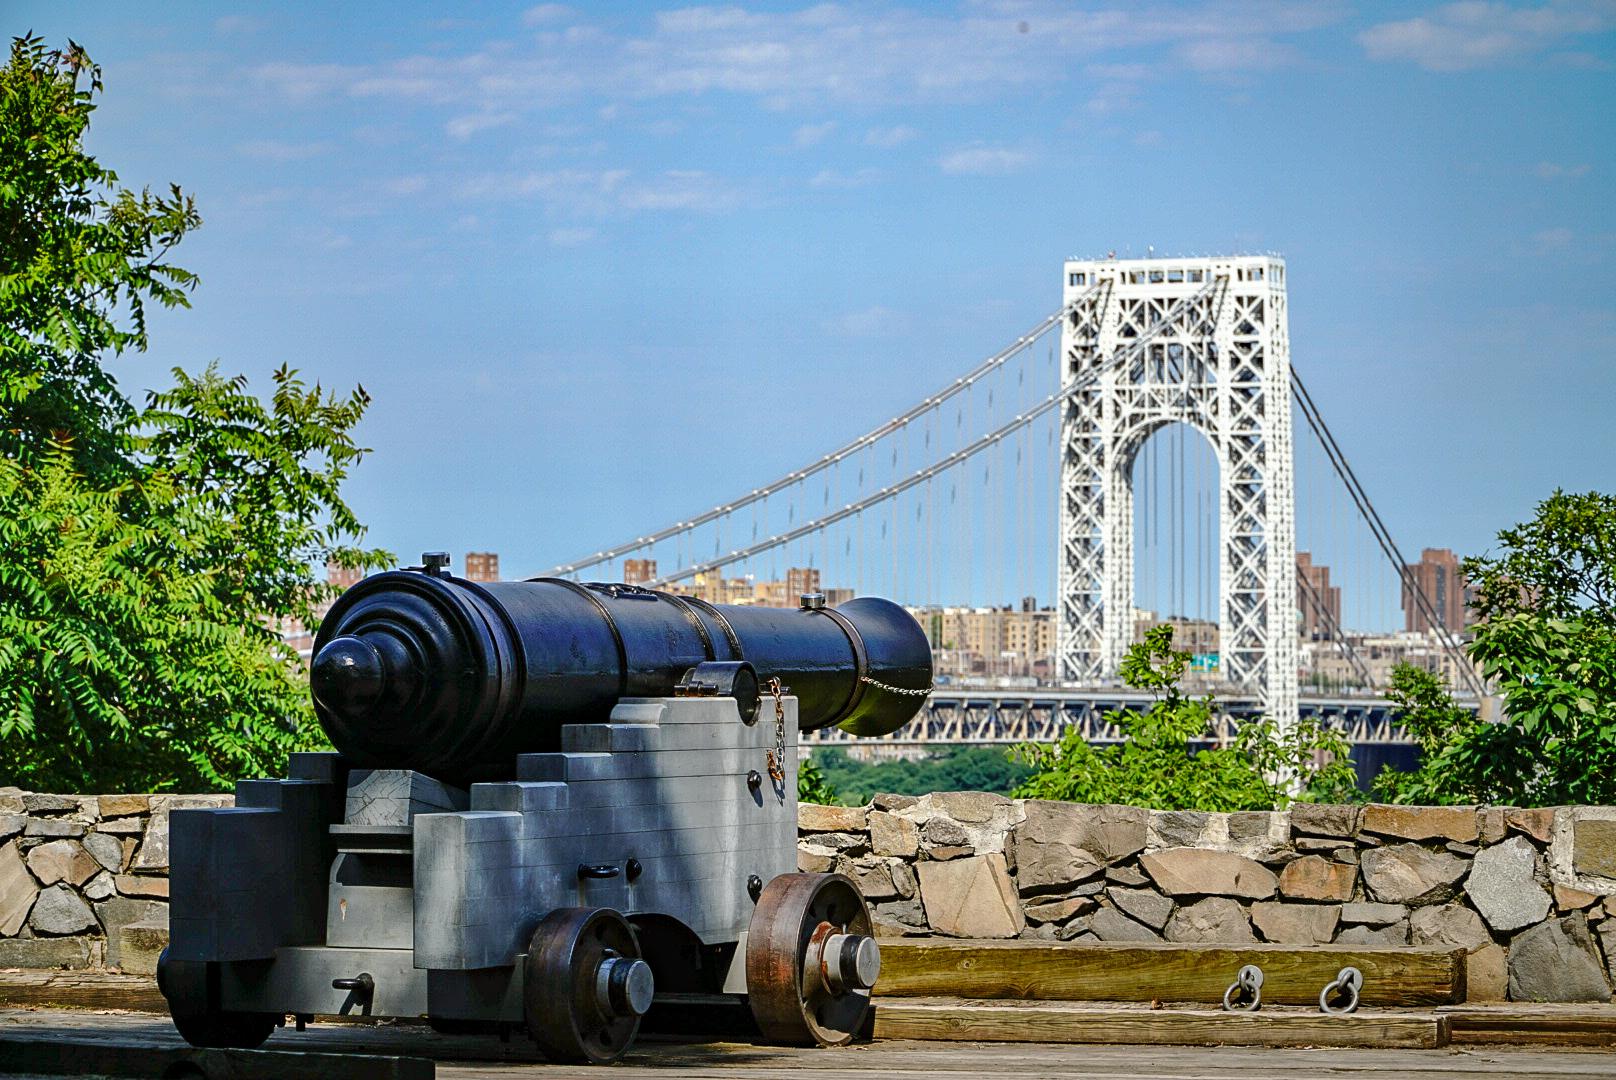 George Washington Bridge, New Jersey, USA